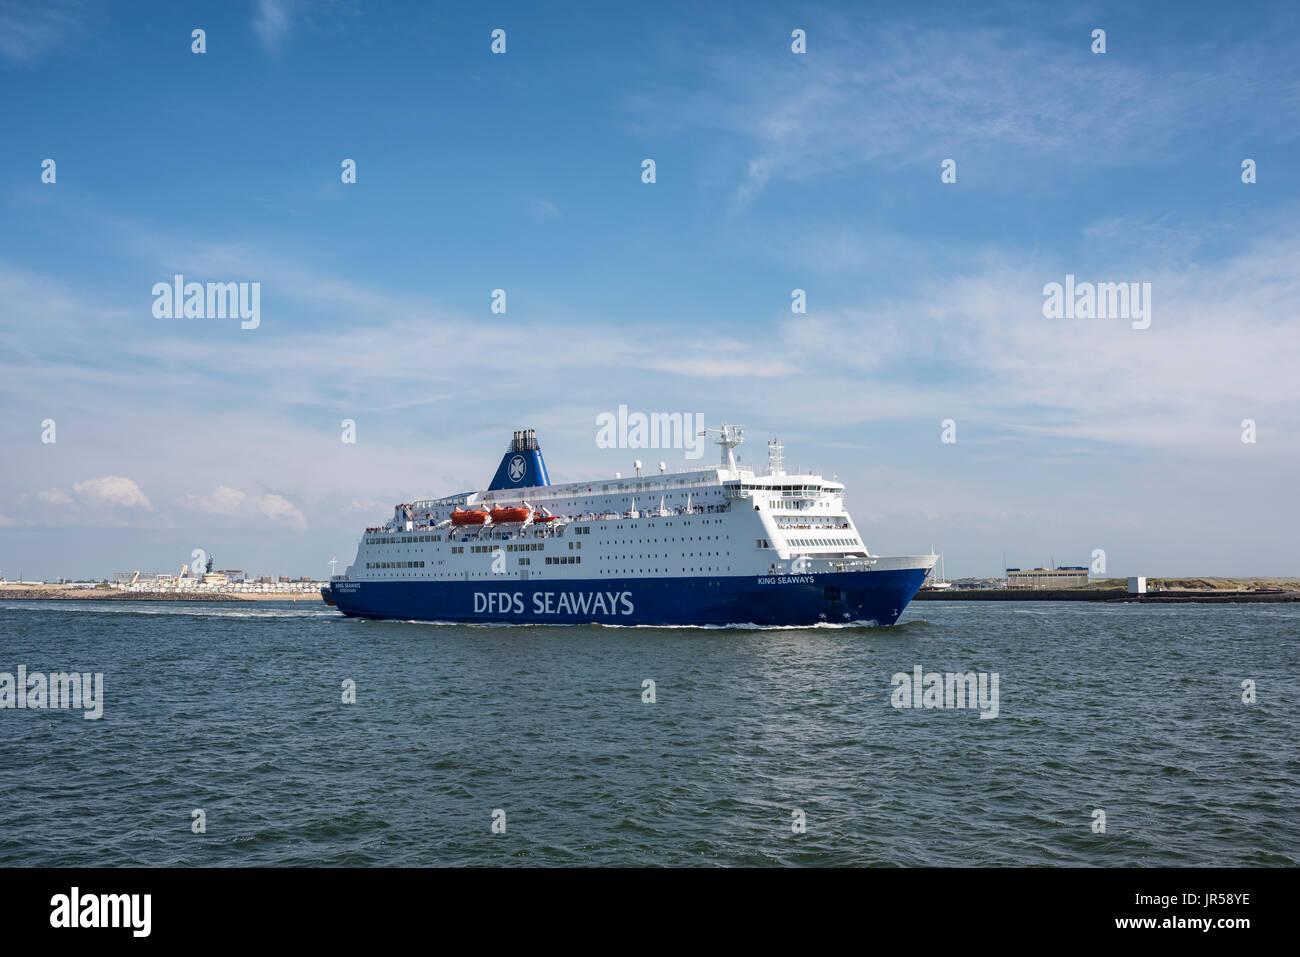 Ferry King Seaways on the Dutch North Sea coast, Ijmuiden, North Holland, Netherlands - Stock Image